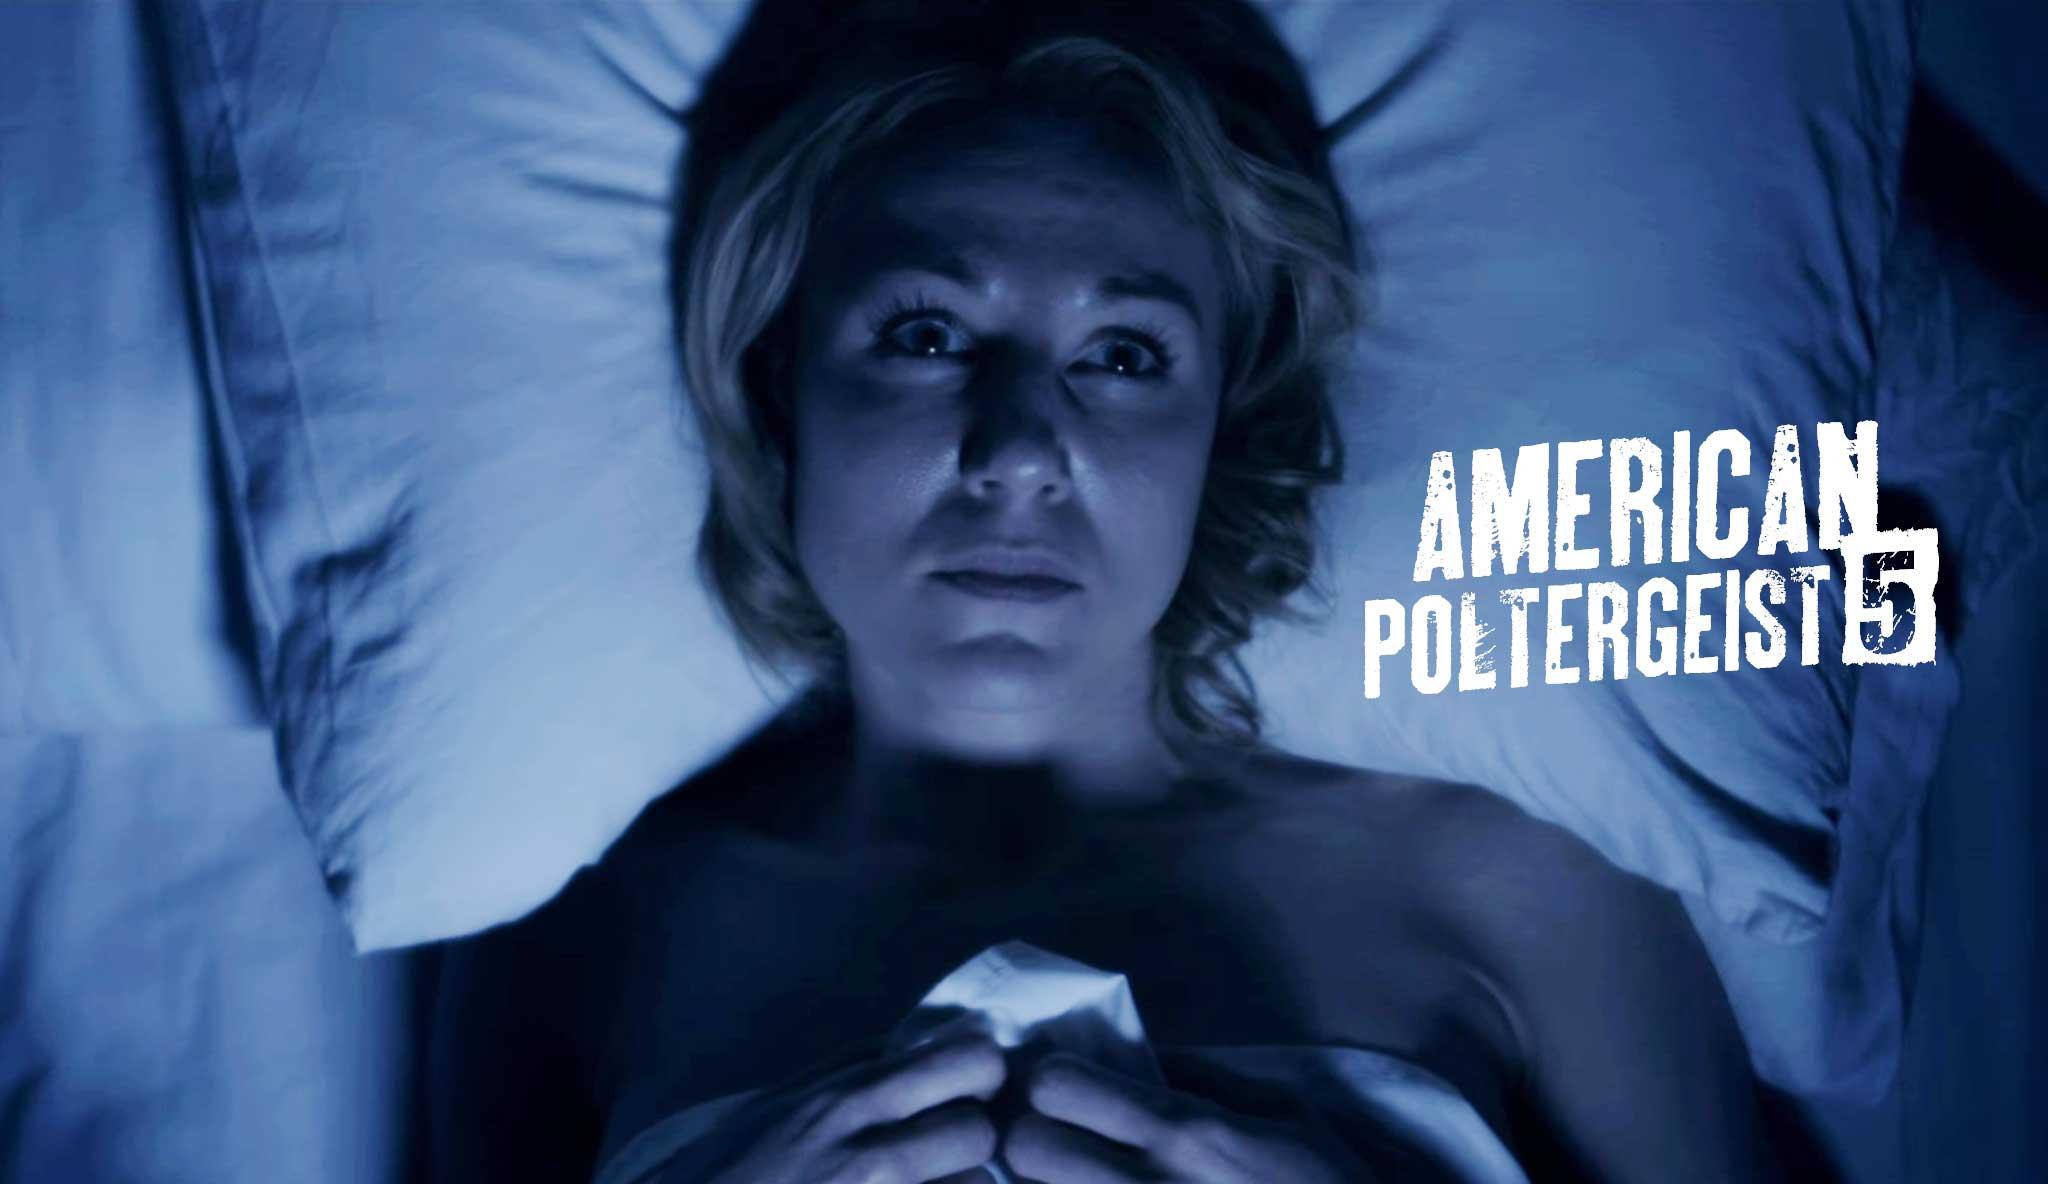 american-poltergeist-5-the-borely-haunting\header.jpg